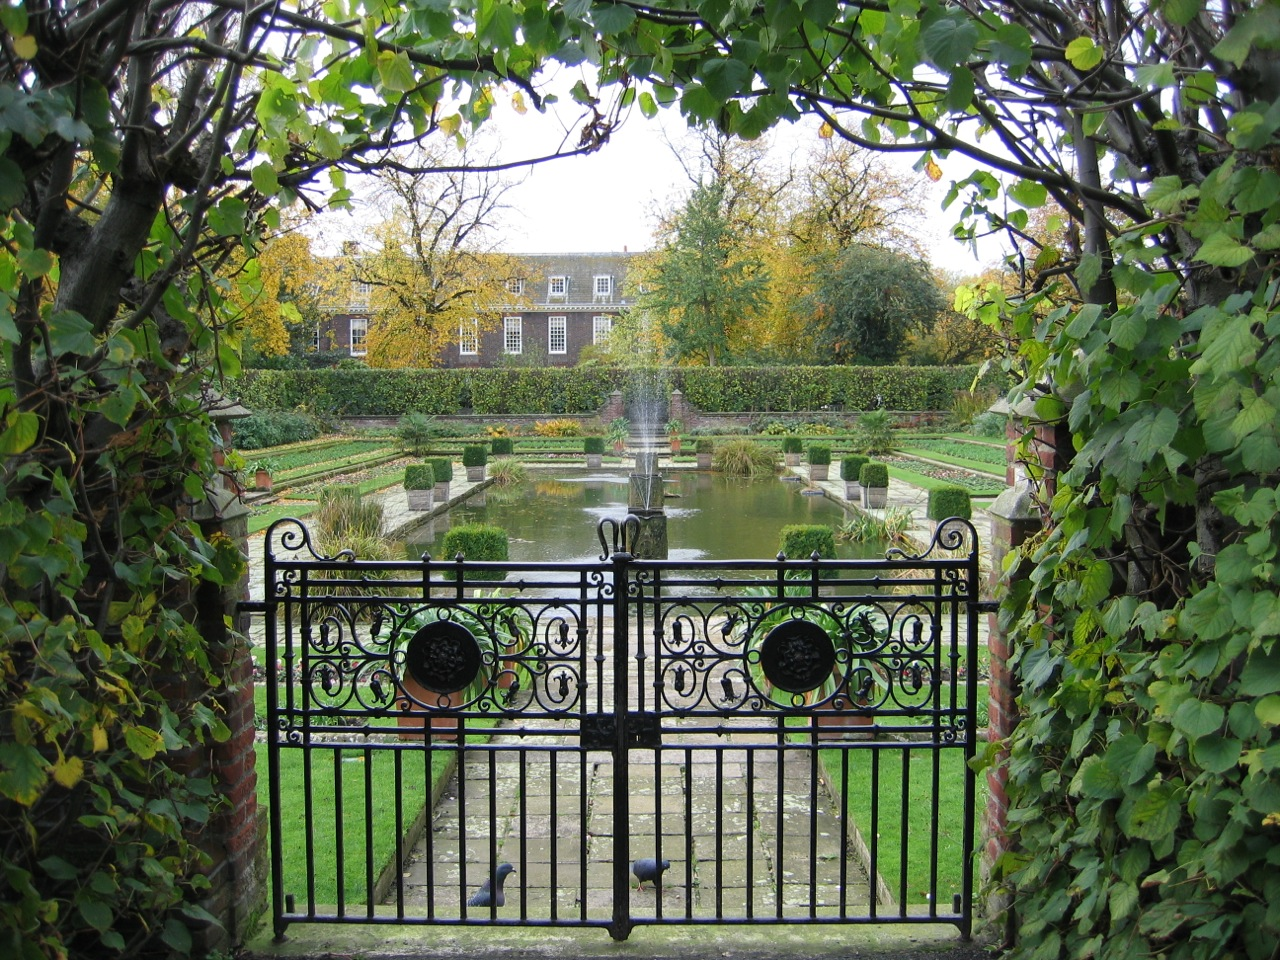 The sunken garden at Kensington Palace, London, UK.